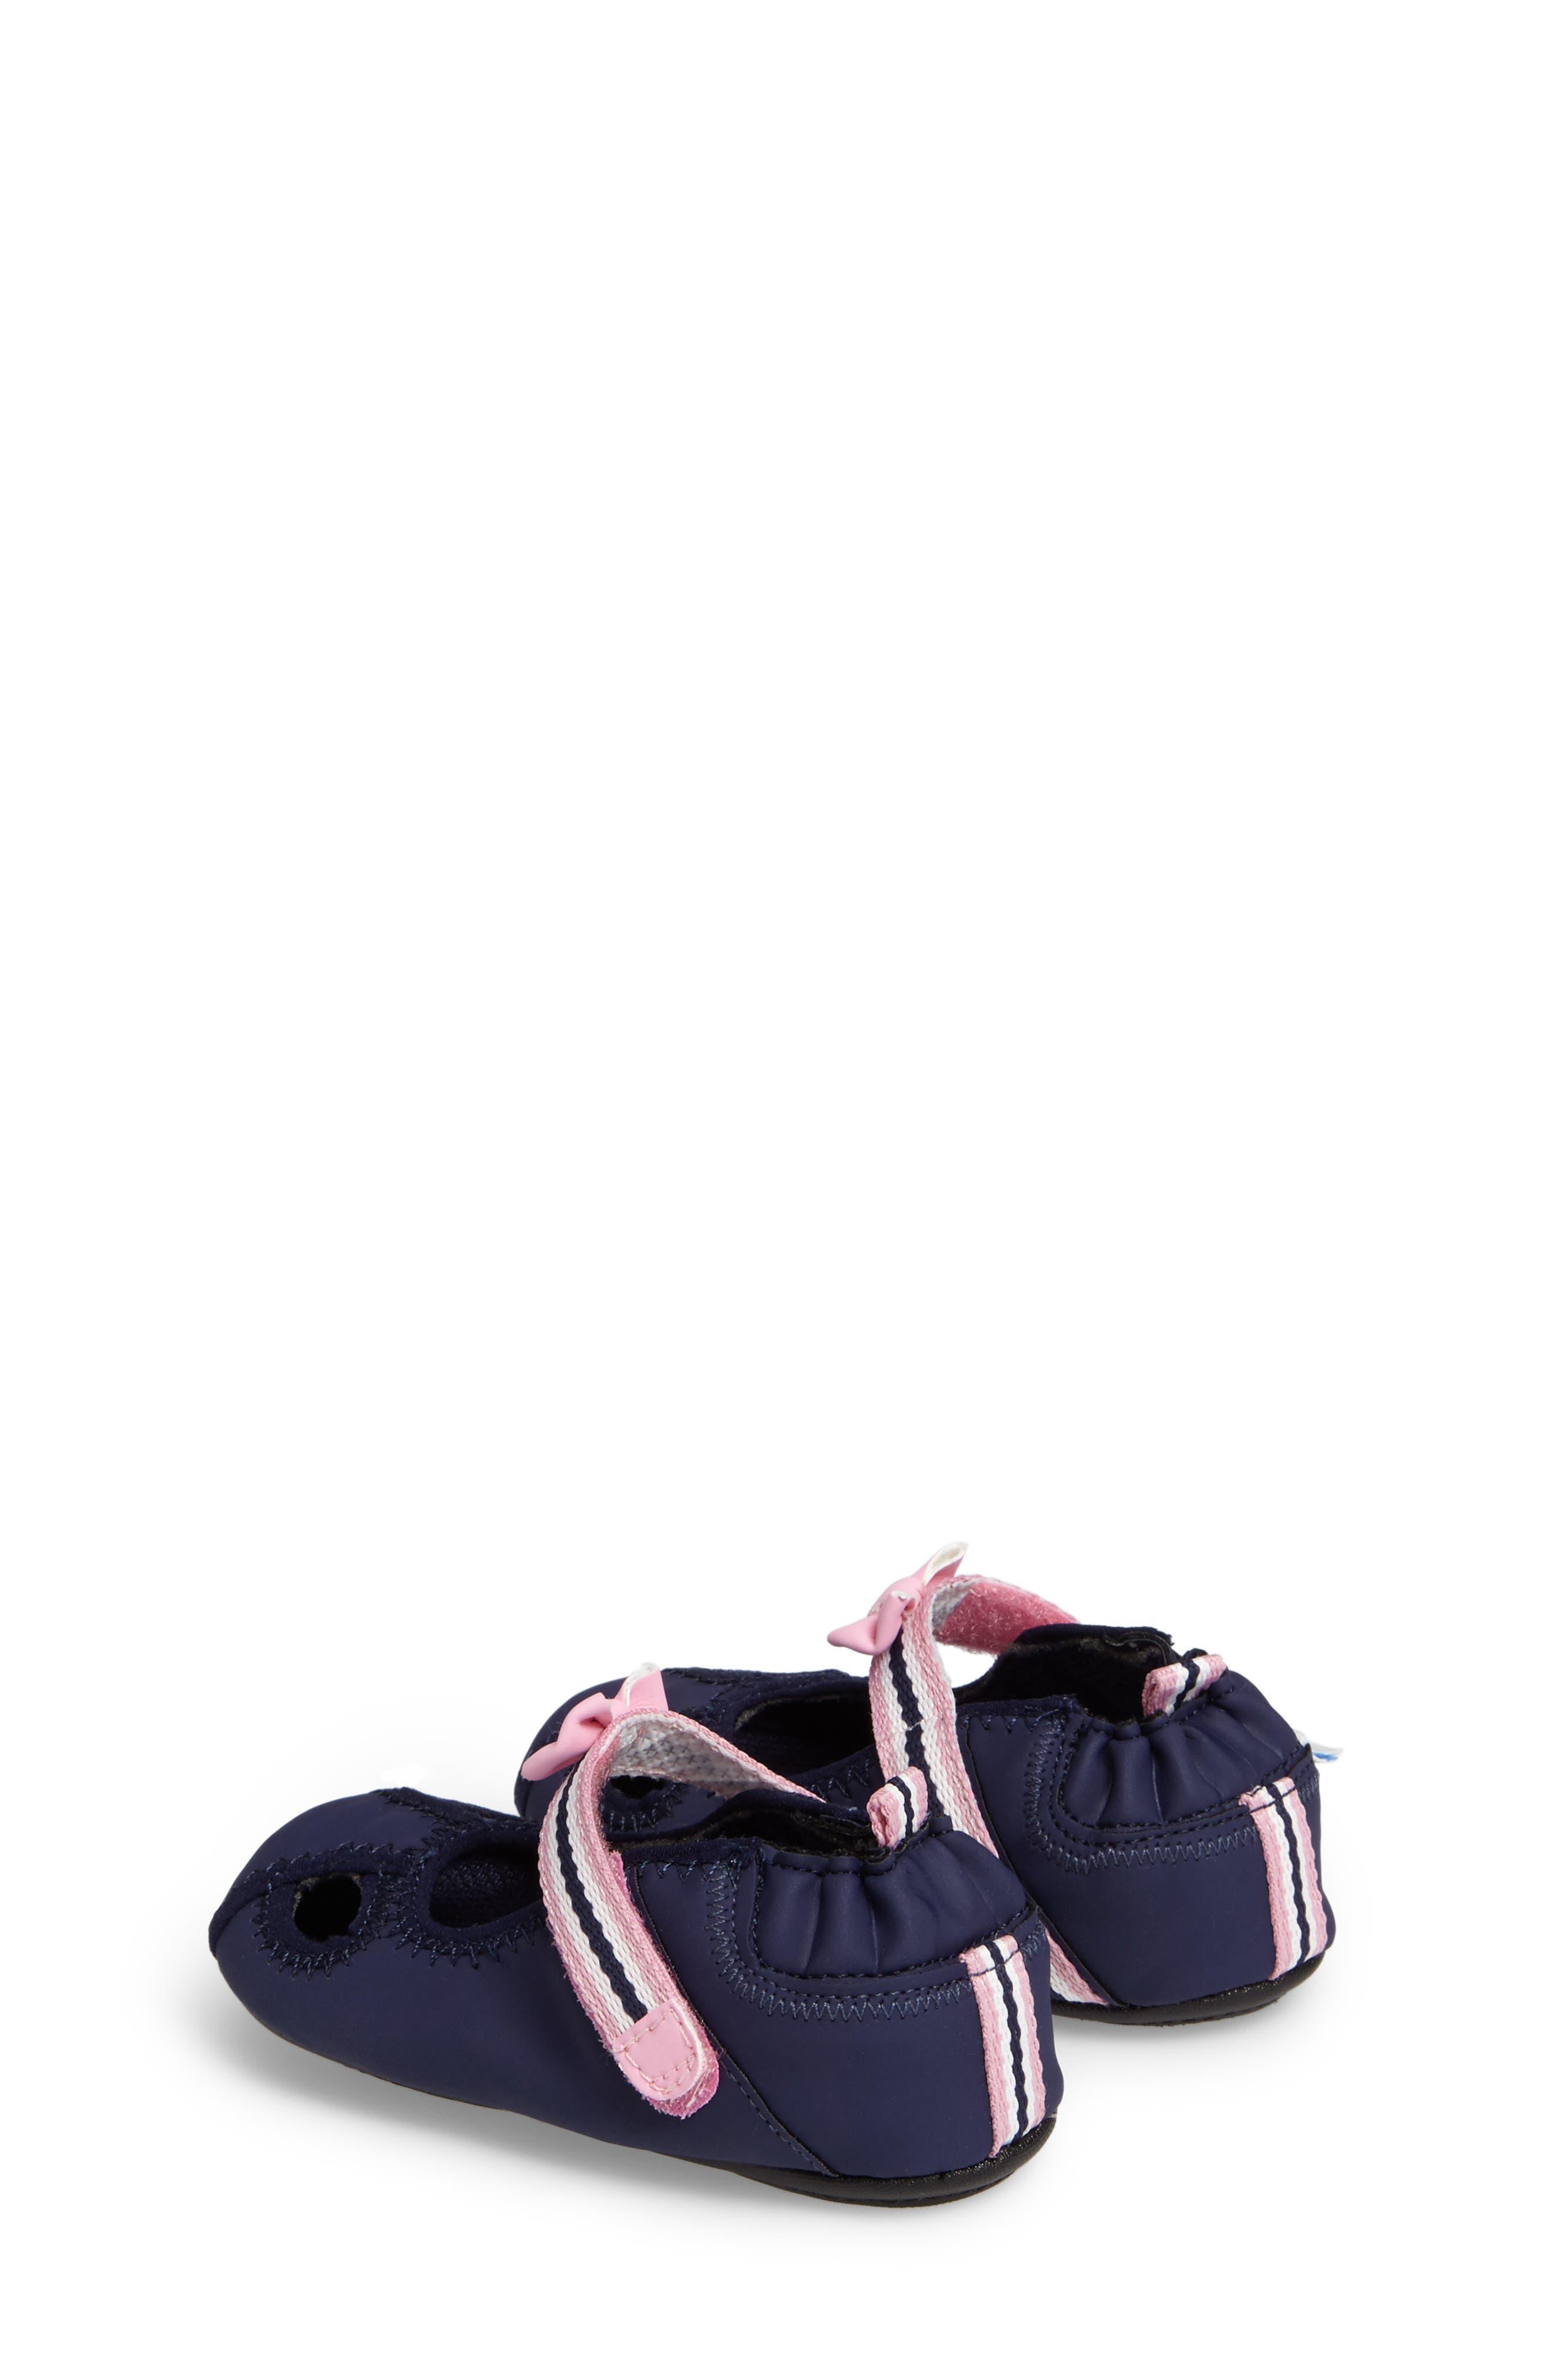 Wave Catcher Crib Shoe,                             Alternate thumbnail 2, color,                             Navy